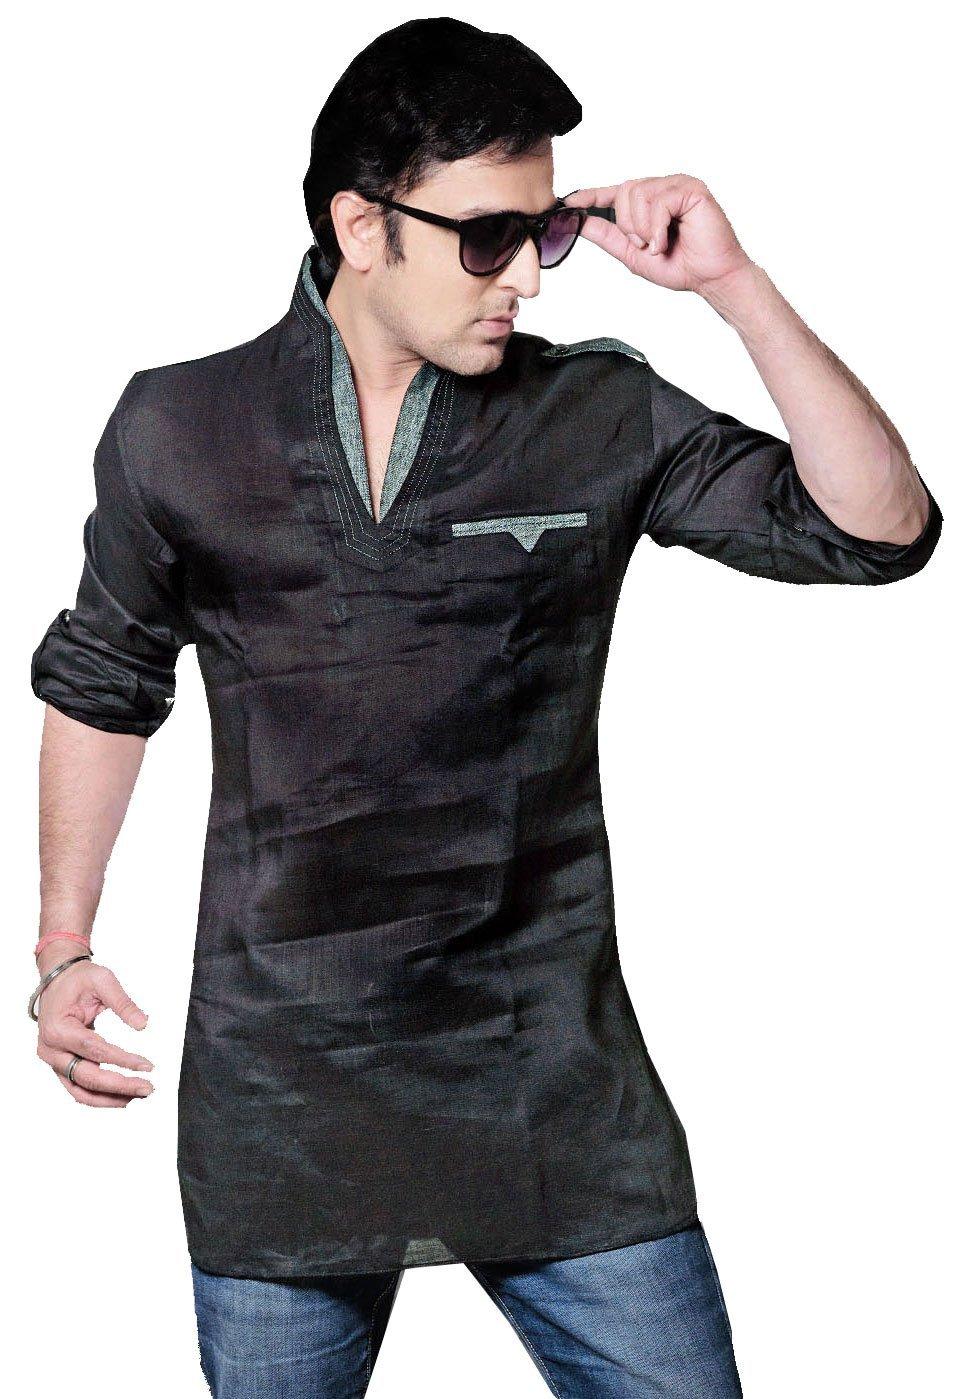 Linen Cotton Mens Short Kurta Dress Shirt Indian Fashion Clothing (Black, L)